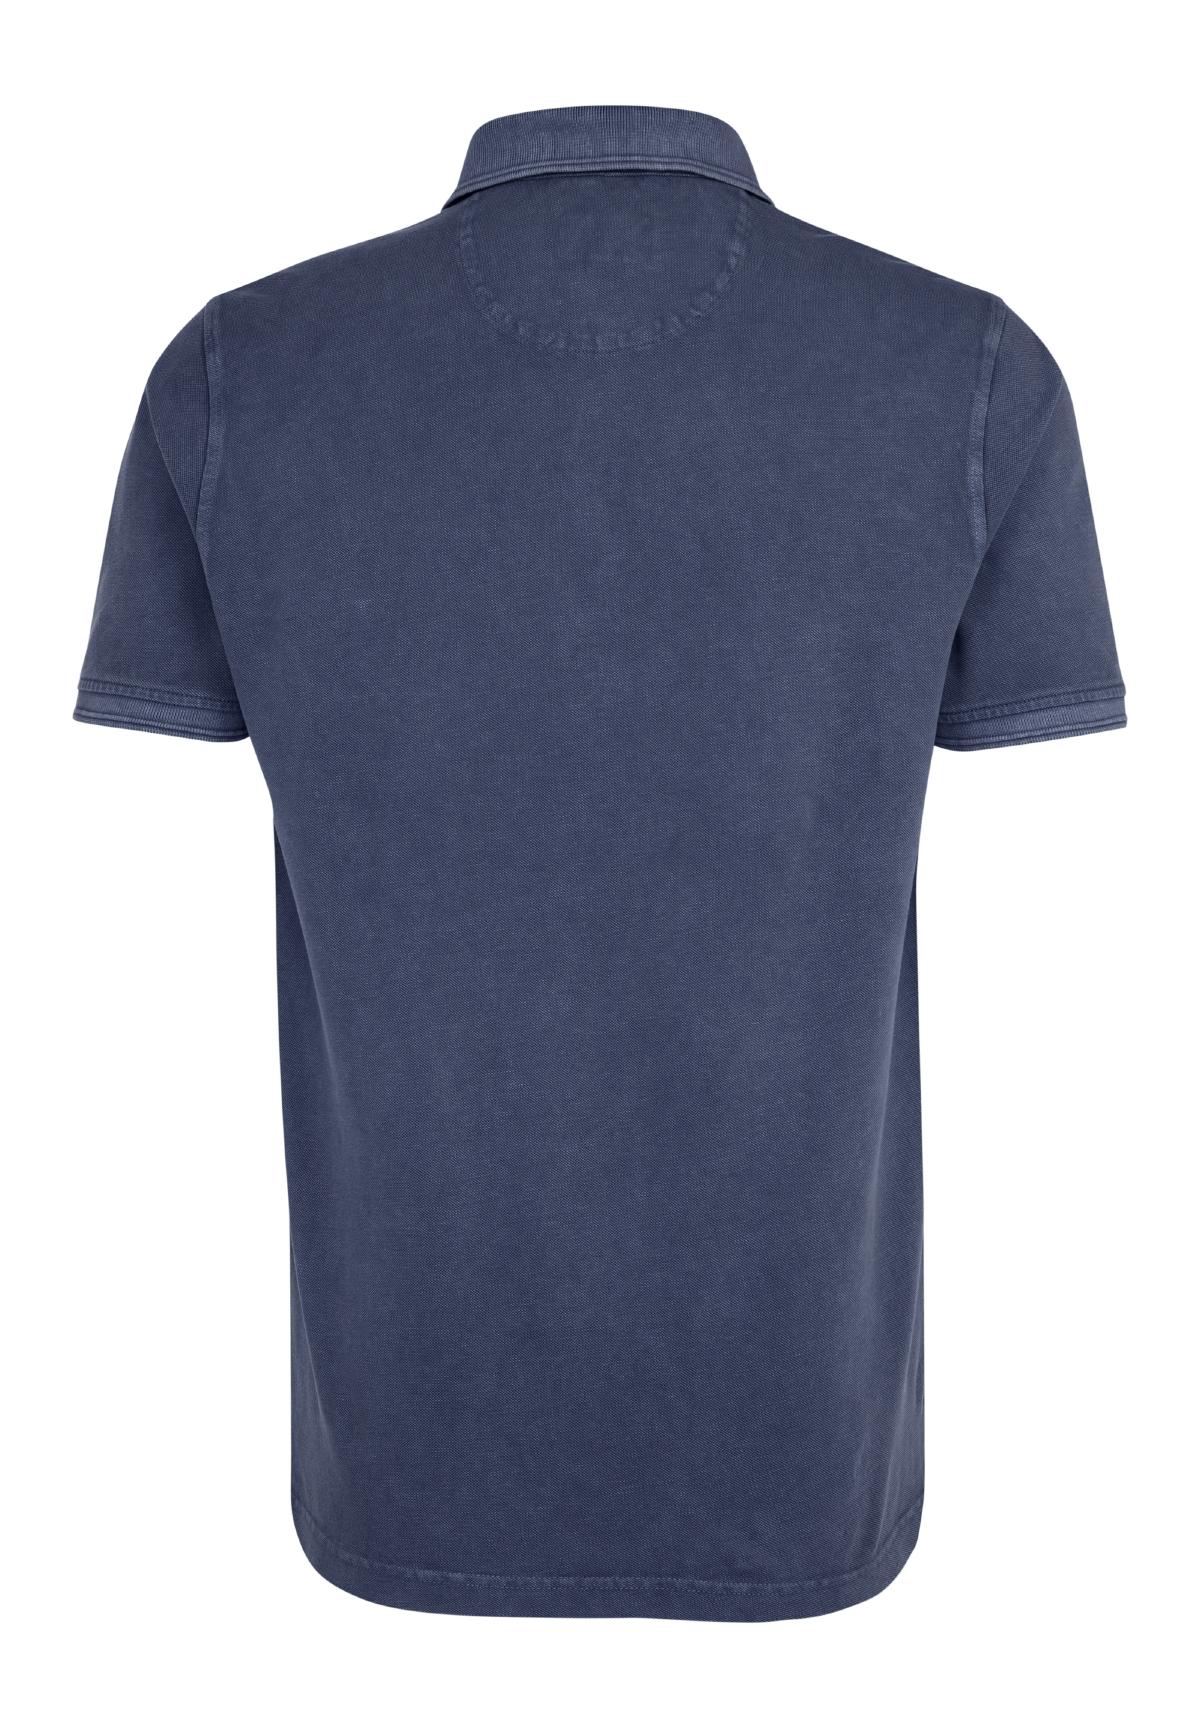 Camel-Active-Herren-Shirt-Poloshirt-Pique-Regular-Fit-NEU Indexbild 28